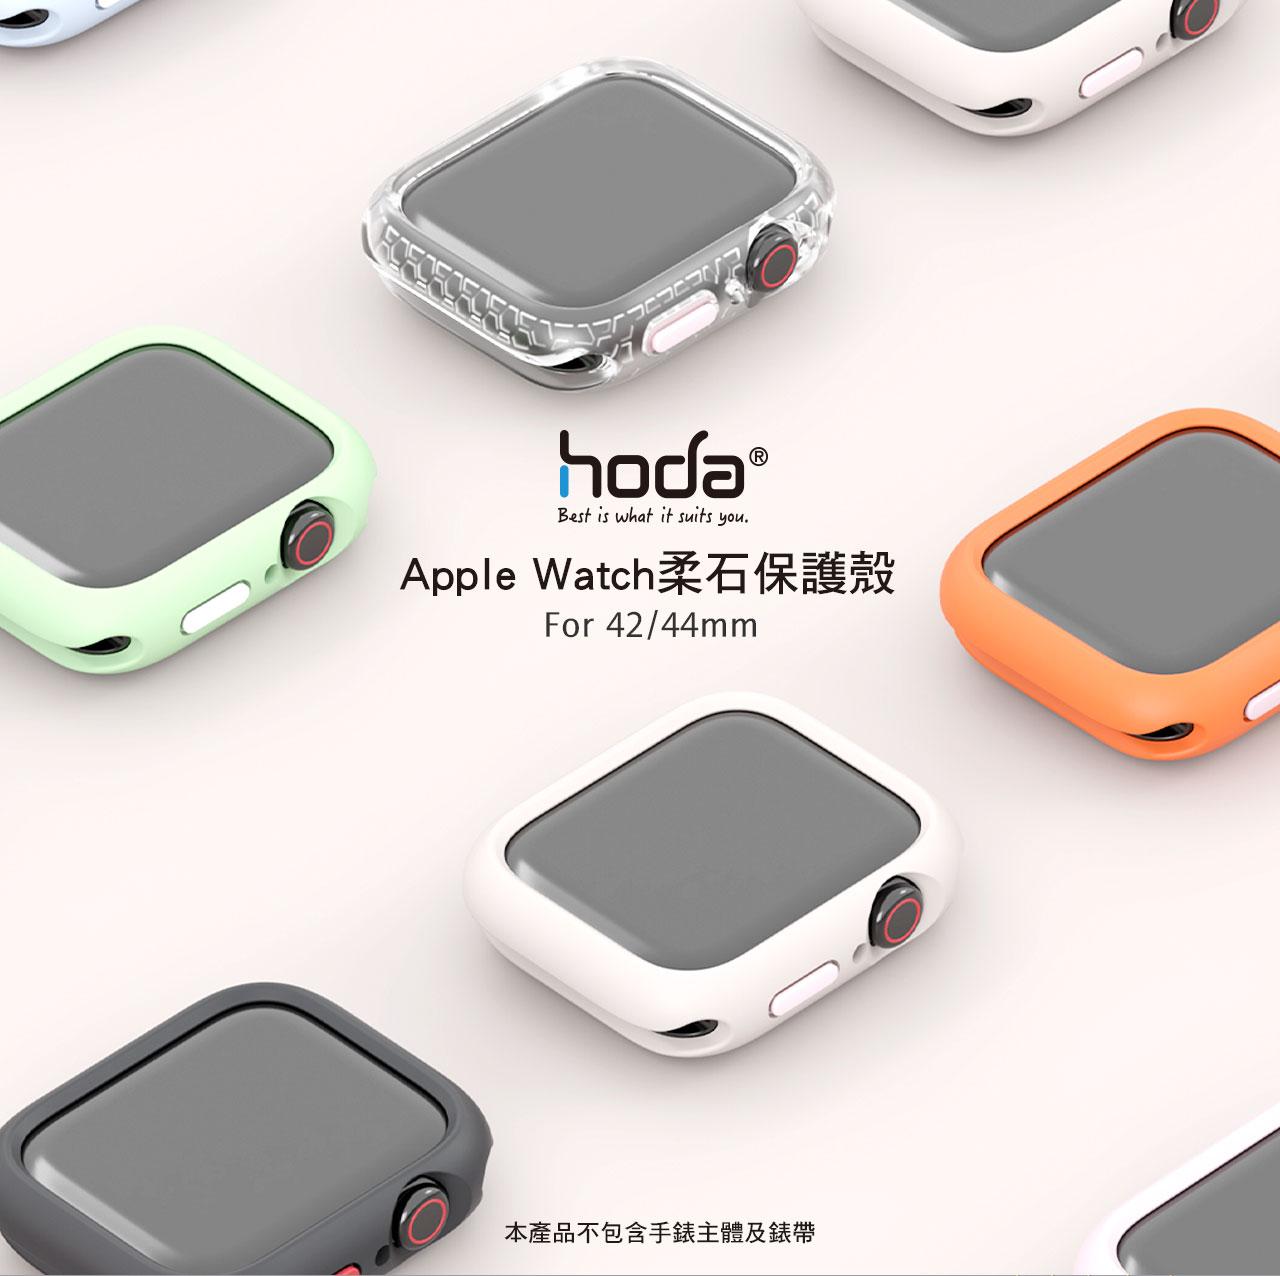 hoda 柔石 防摔 手錶保護殼 防摔殼 手錶殼 適用於Apple Watch 4代 5代 40mm 42mm 44mm